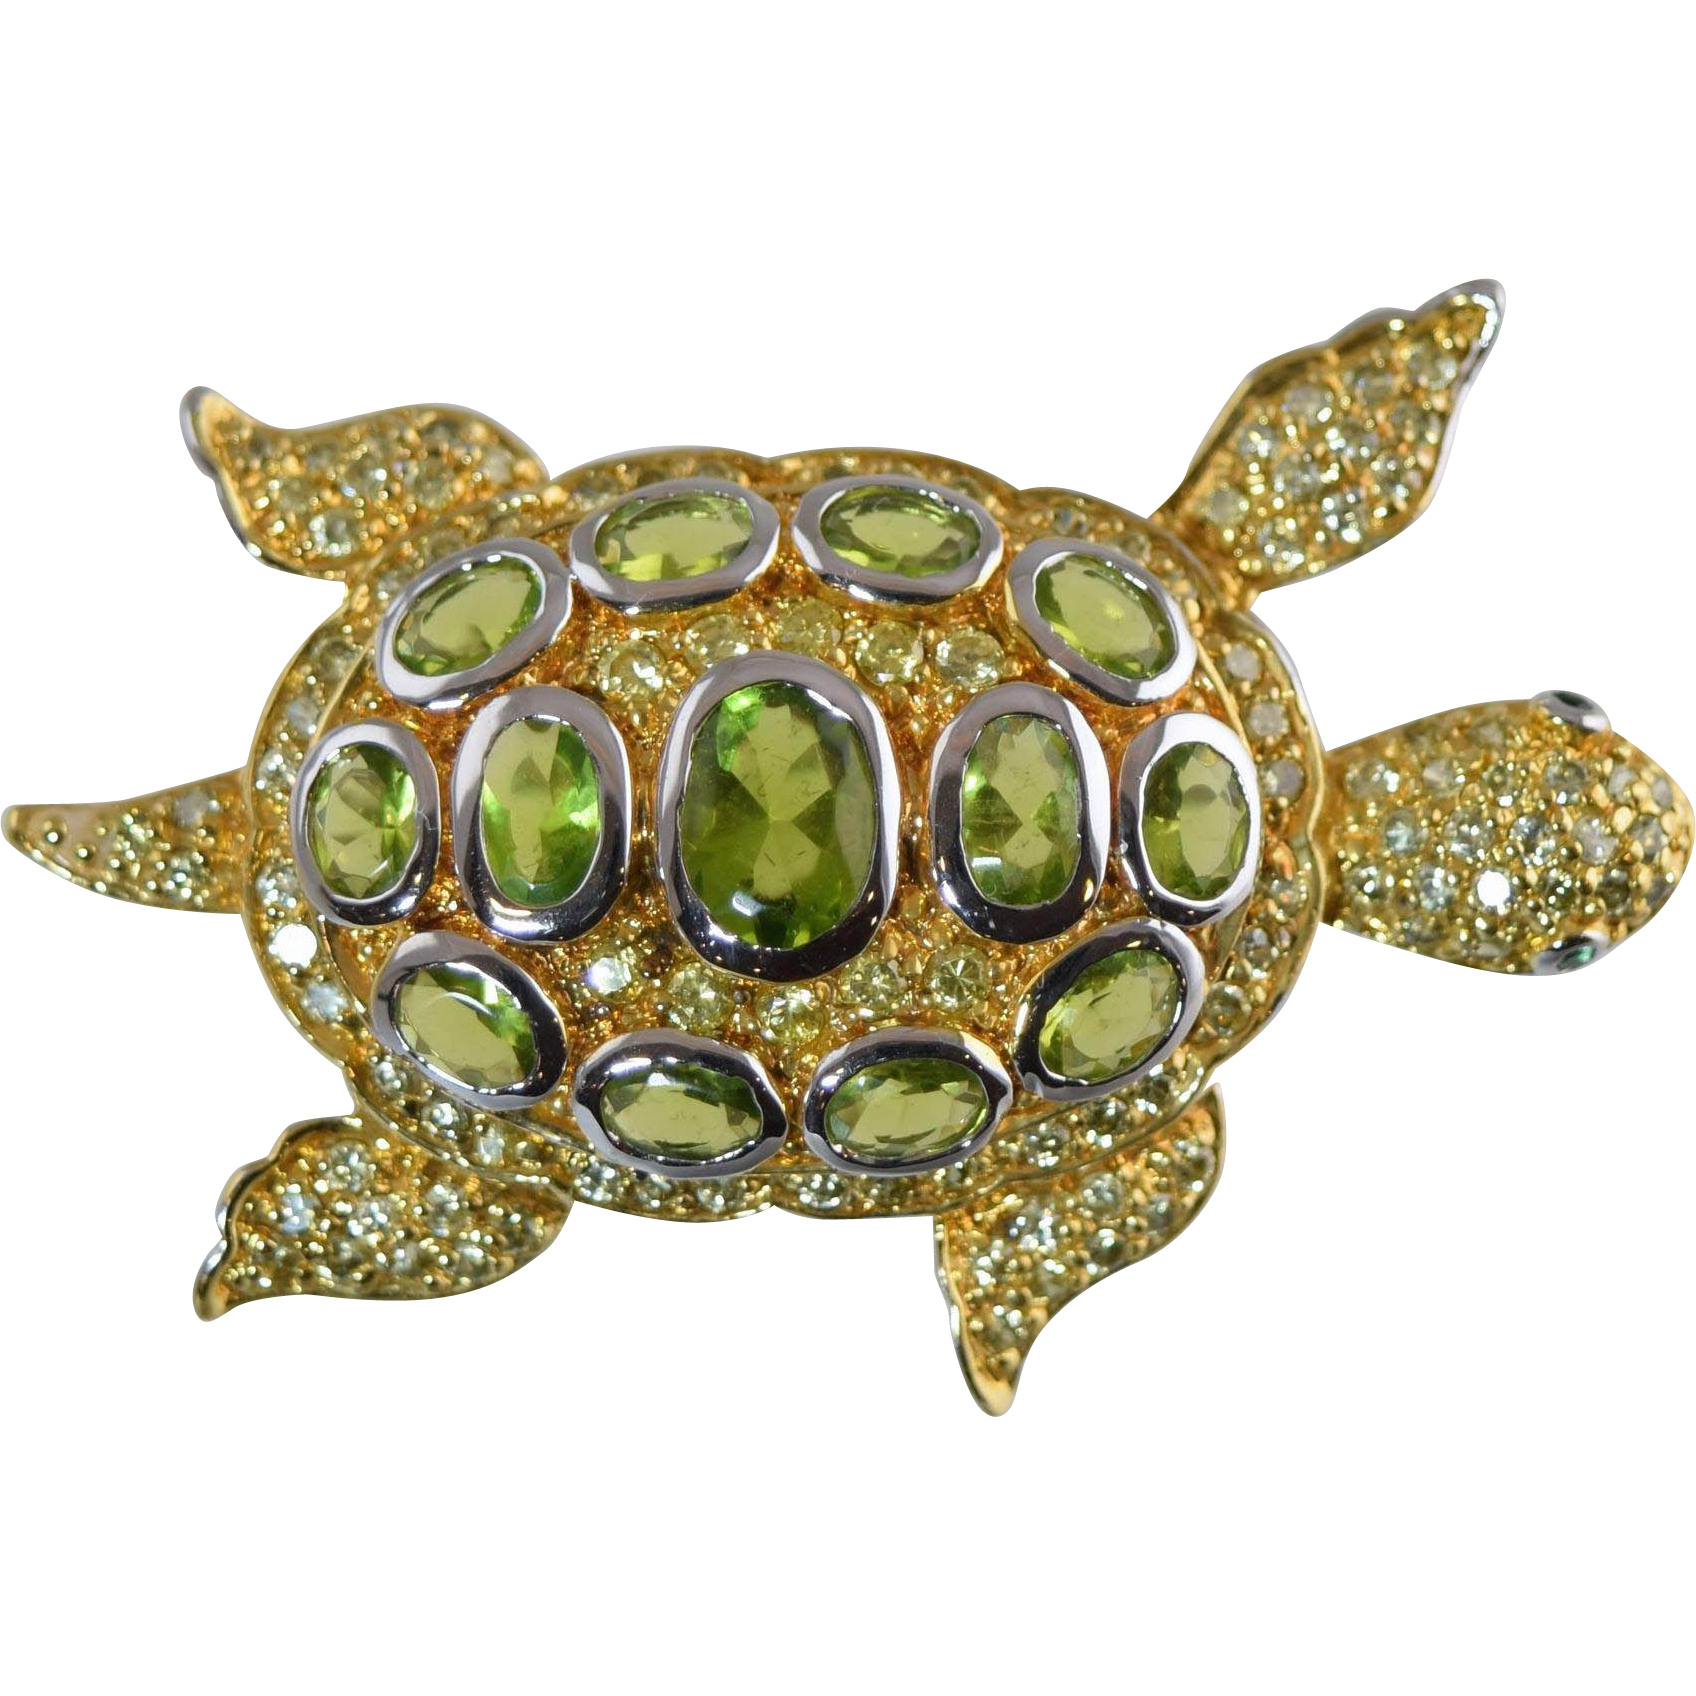 charles winston sterling silver sea turtle pin peridot